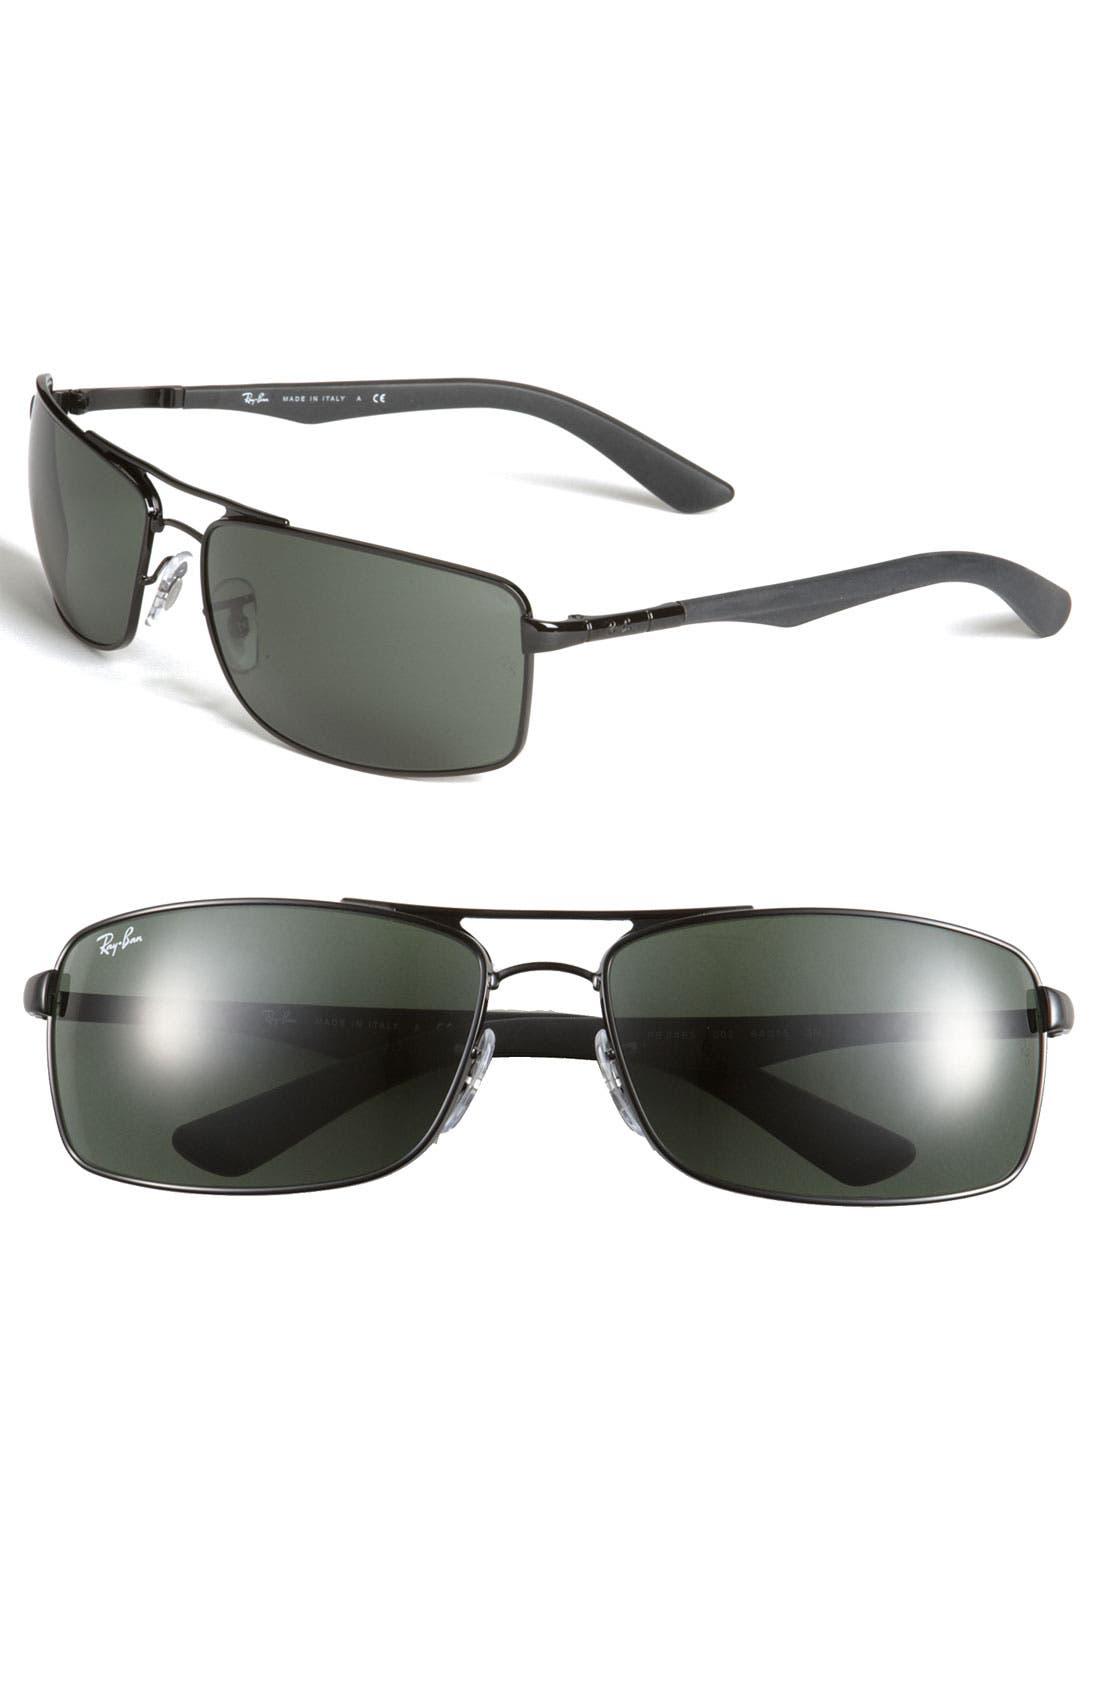 Alternate Image 1 Selected - Ray-Ban Double Bridge 64mm Rectangular Sunglasses